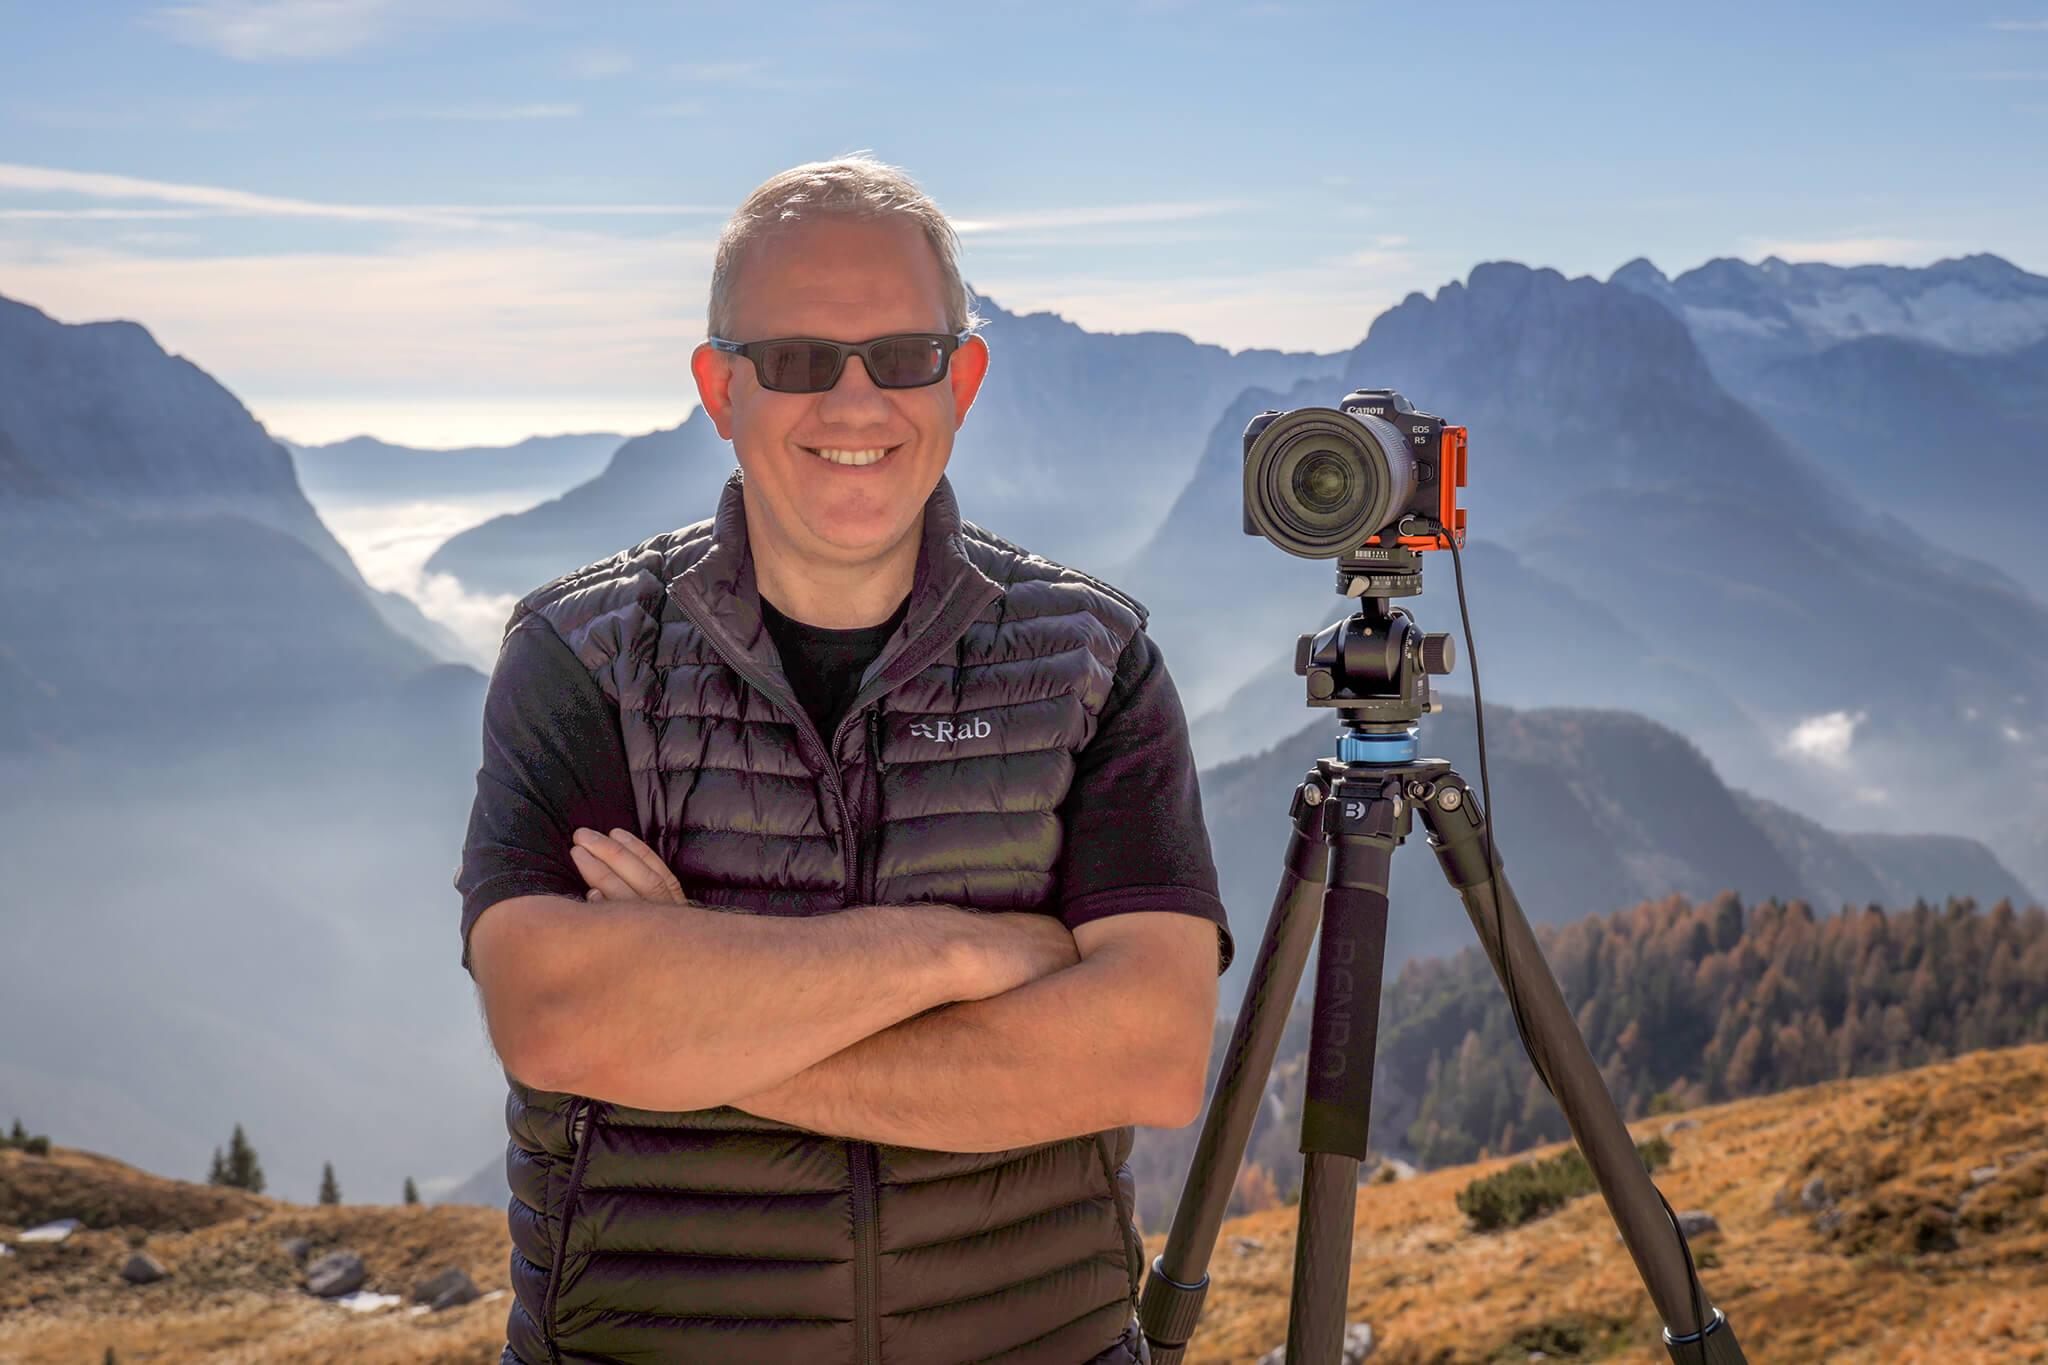 Melvin Nicholson - UK based photographer and workshop leader.